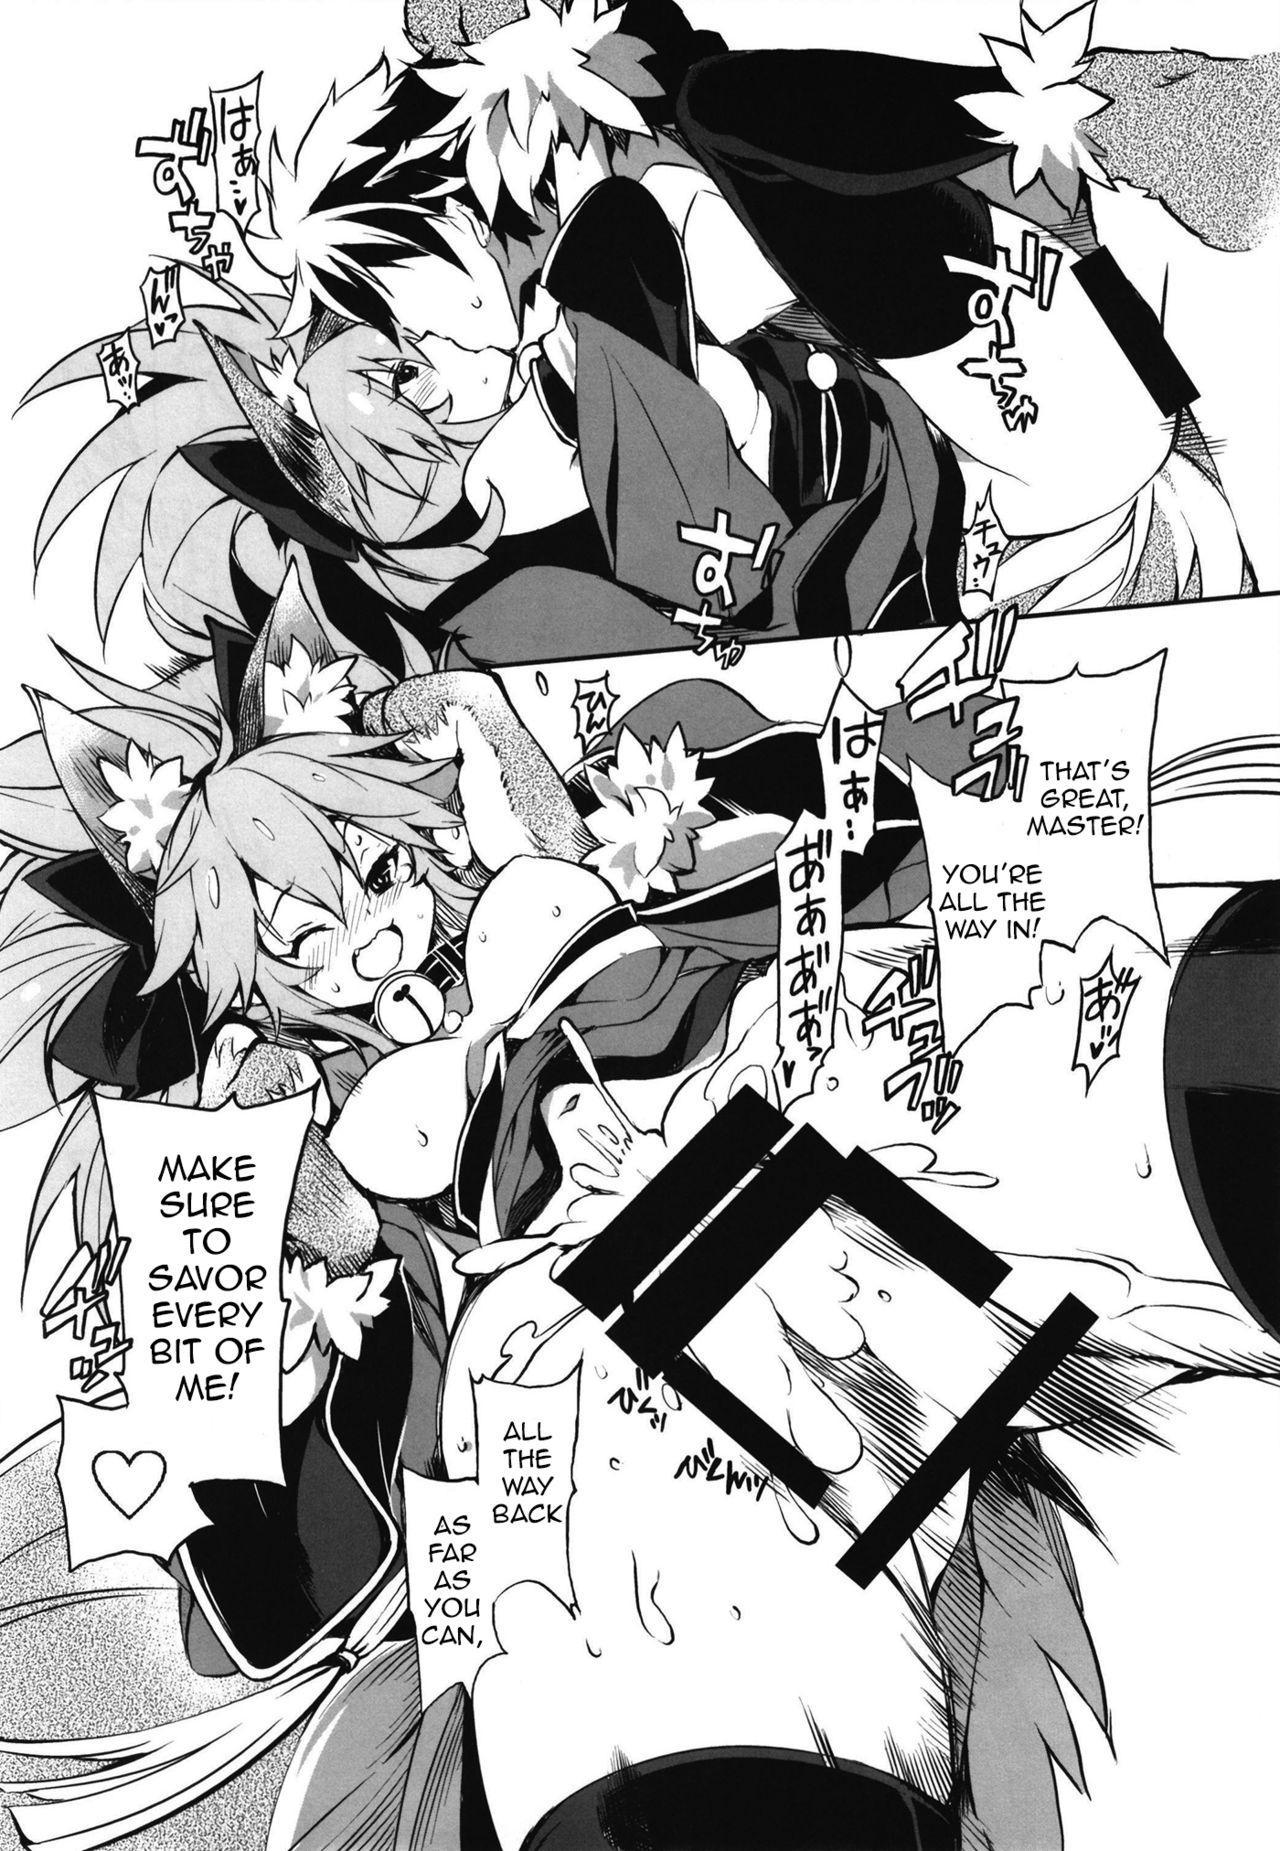 [Tomato Kanzume (Tomatomato)] Cat-chan Kozukuri Daisakusen | Cat-chan's Childmaking Grand Strategy (Fate/Grand Order) [English] [Kemonomimi Saikou] [Digital] 12